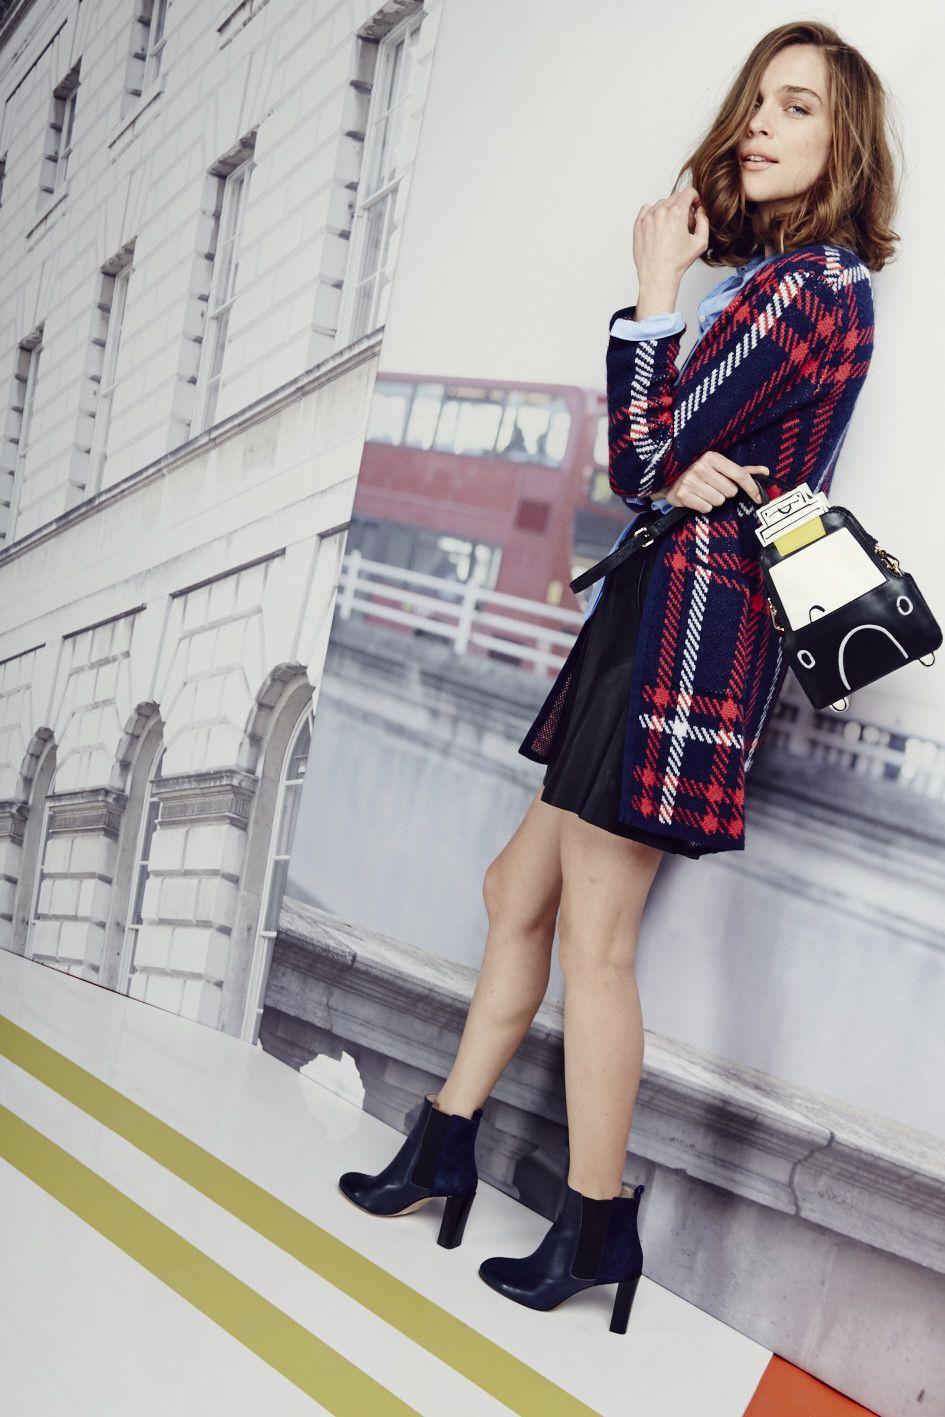 Boden autumn winter 15 fashion pinterest manteau for Boden england mode